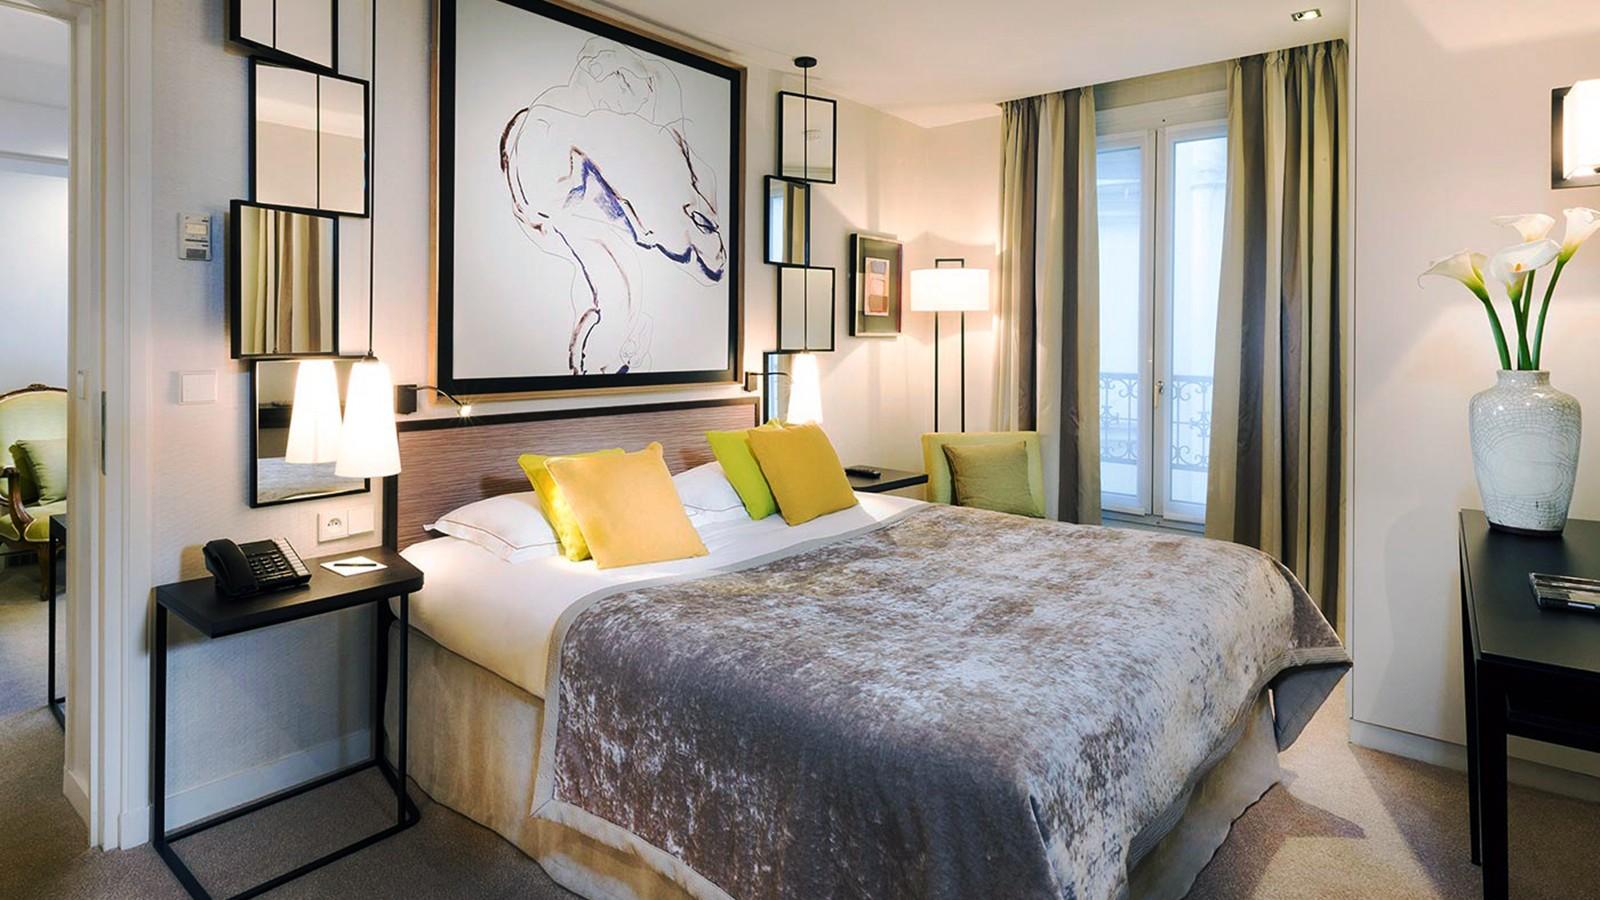 EFI Design Hotel Balmoral Paris Efi Design (1) 1171